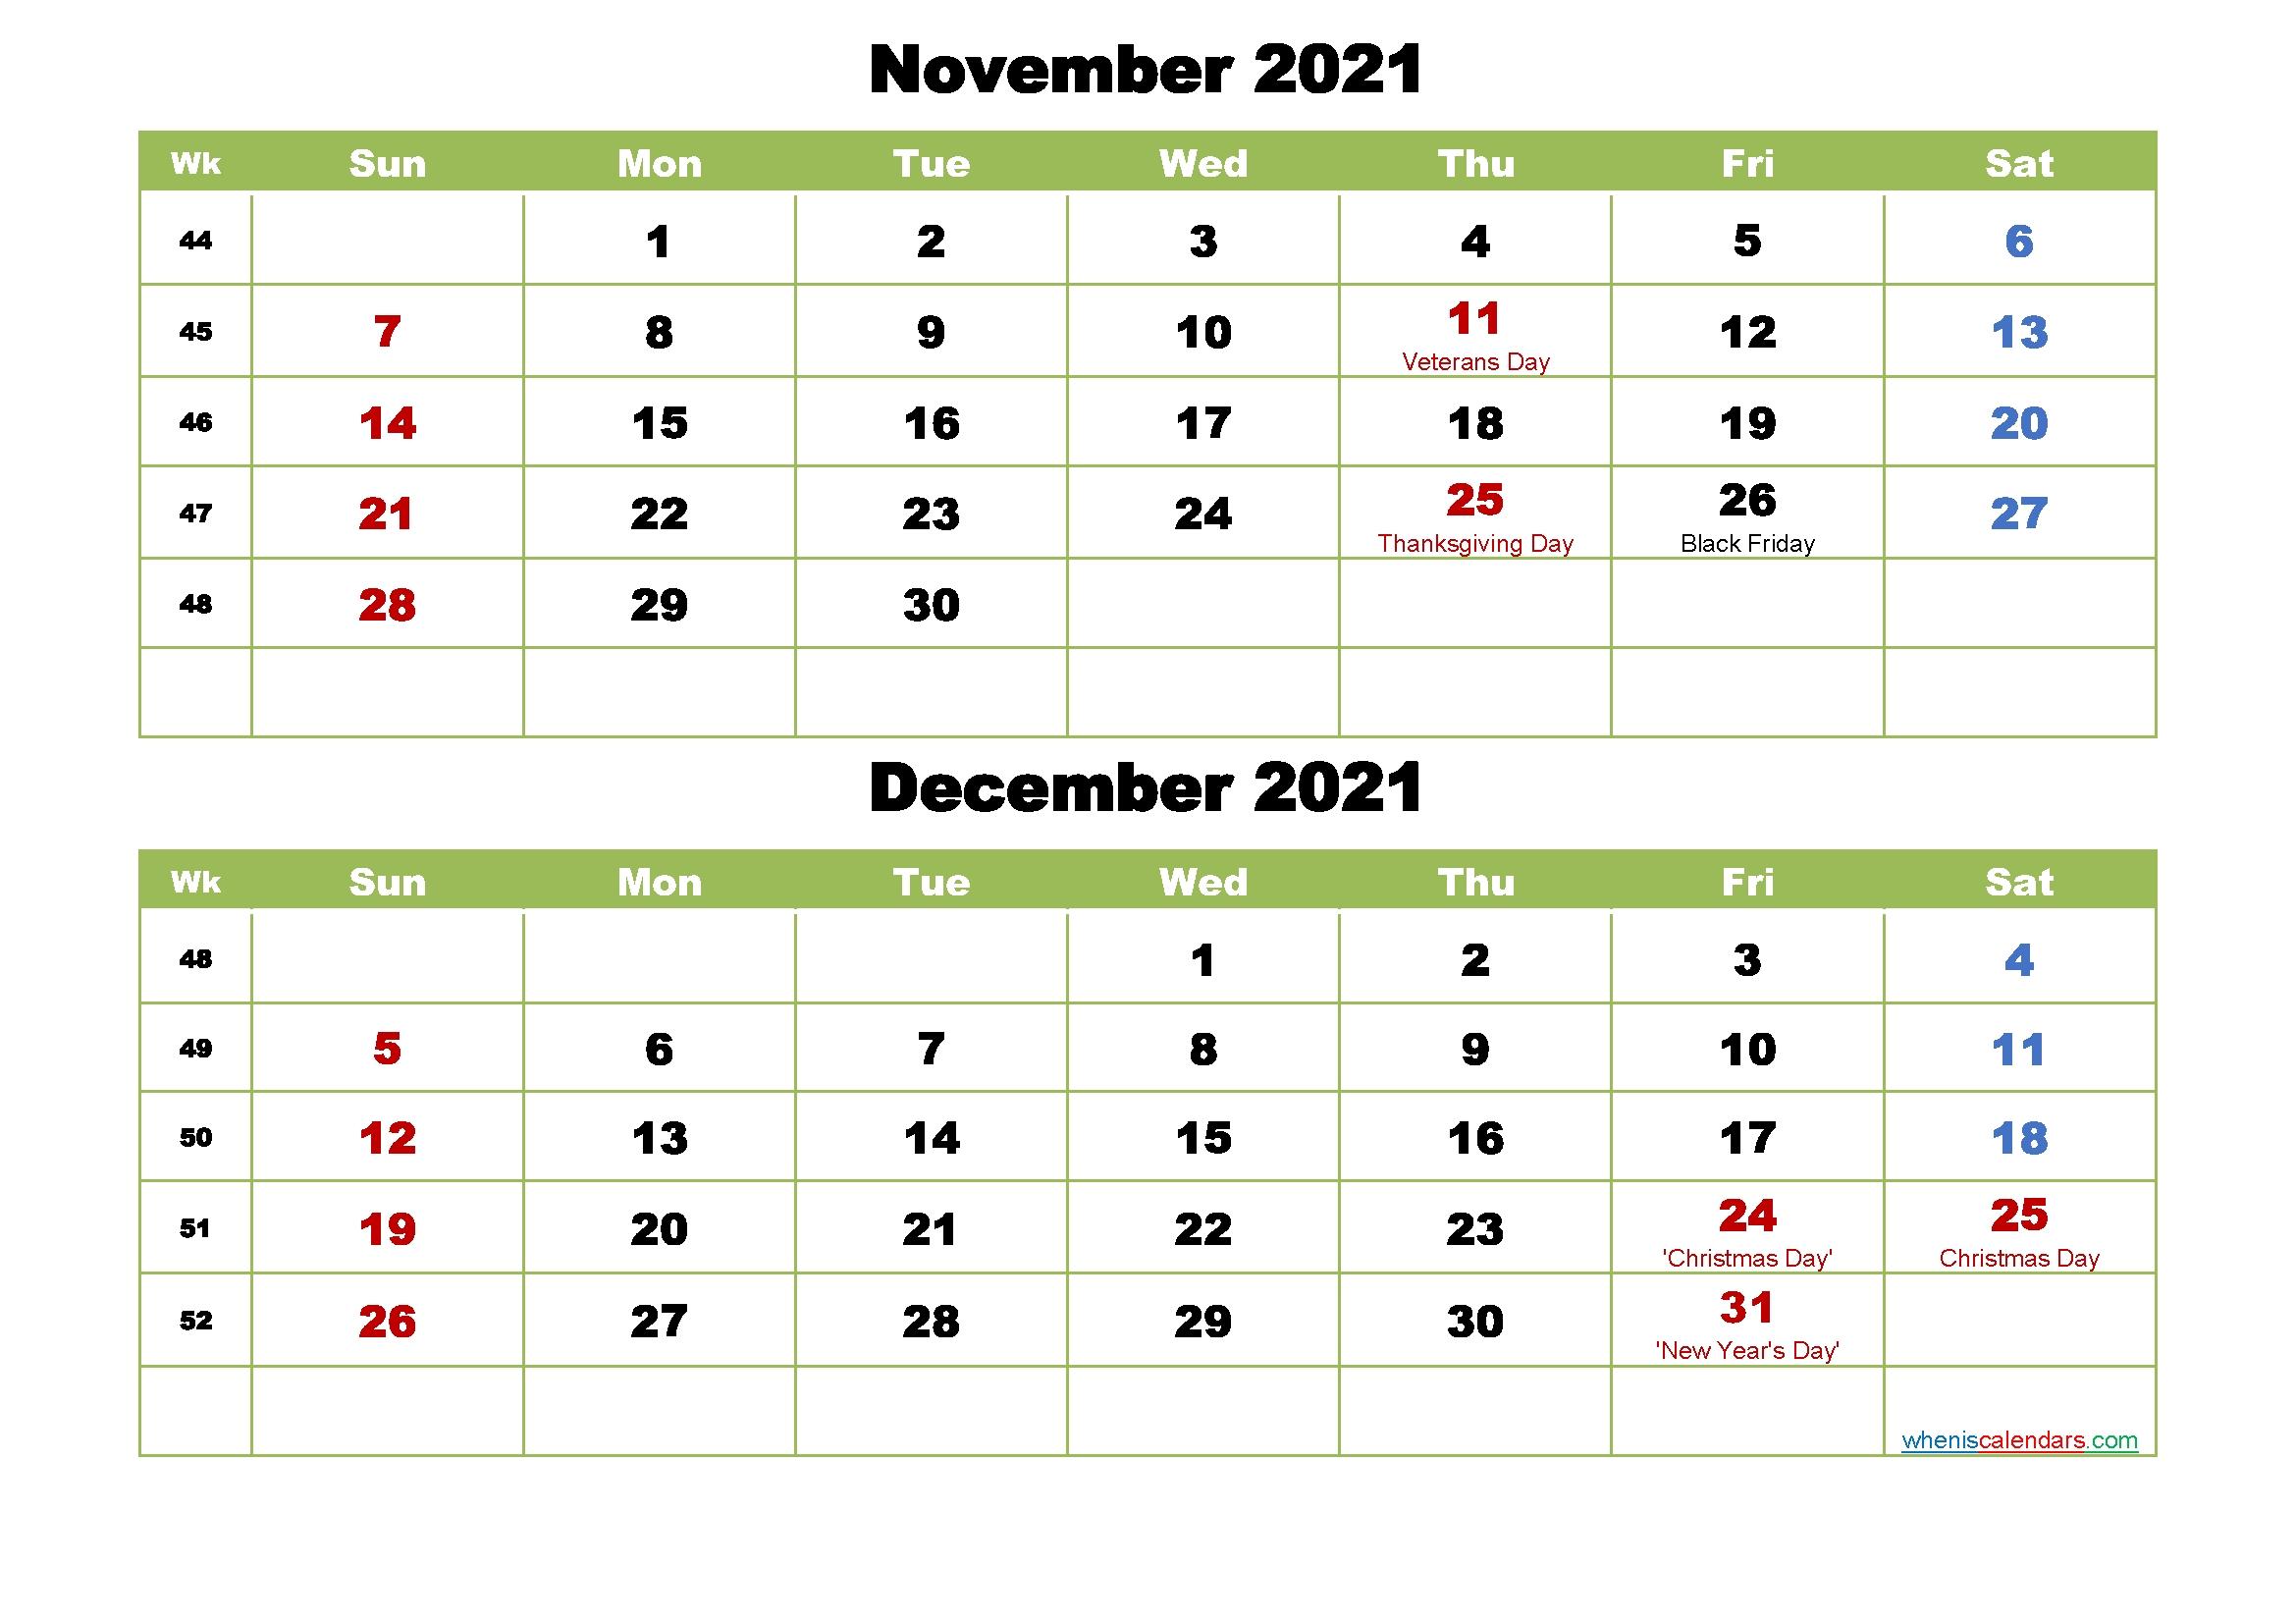 Catch Calendars For November And December 2021